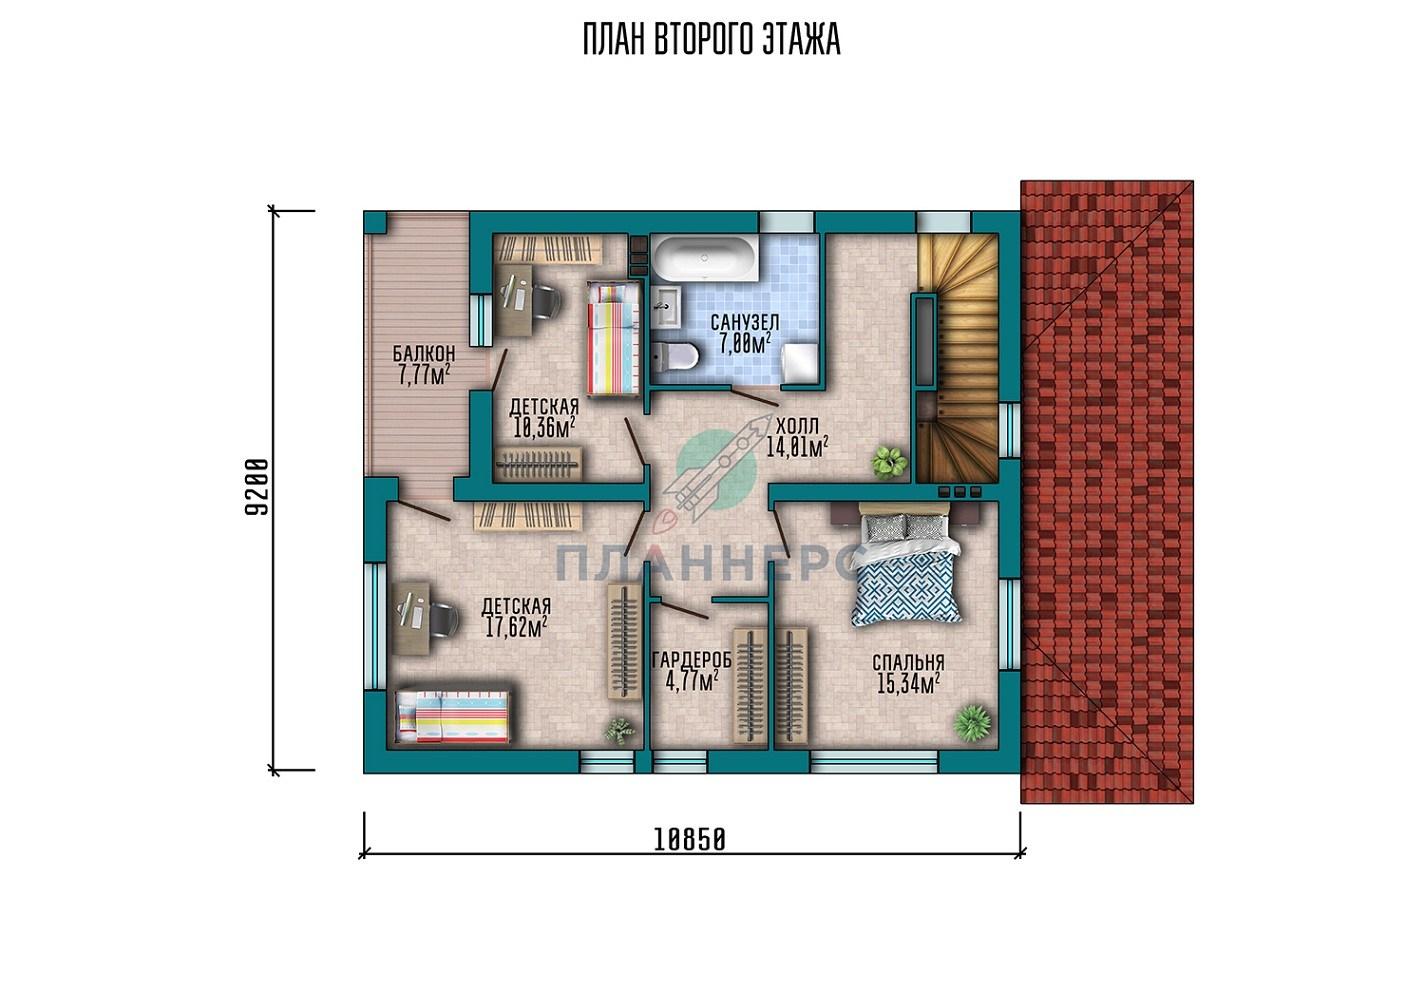 Проект Планнерс 024-161-2 план